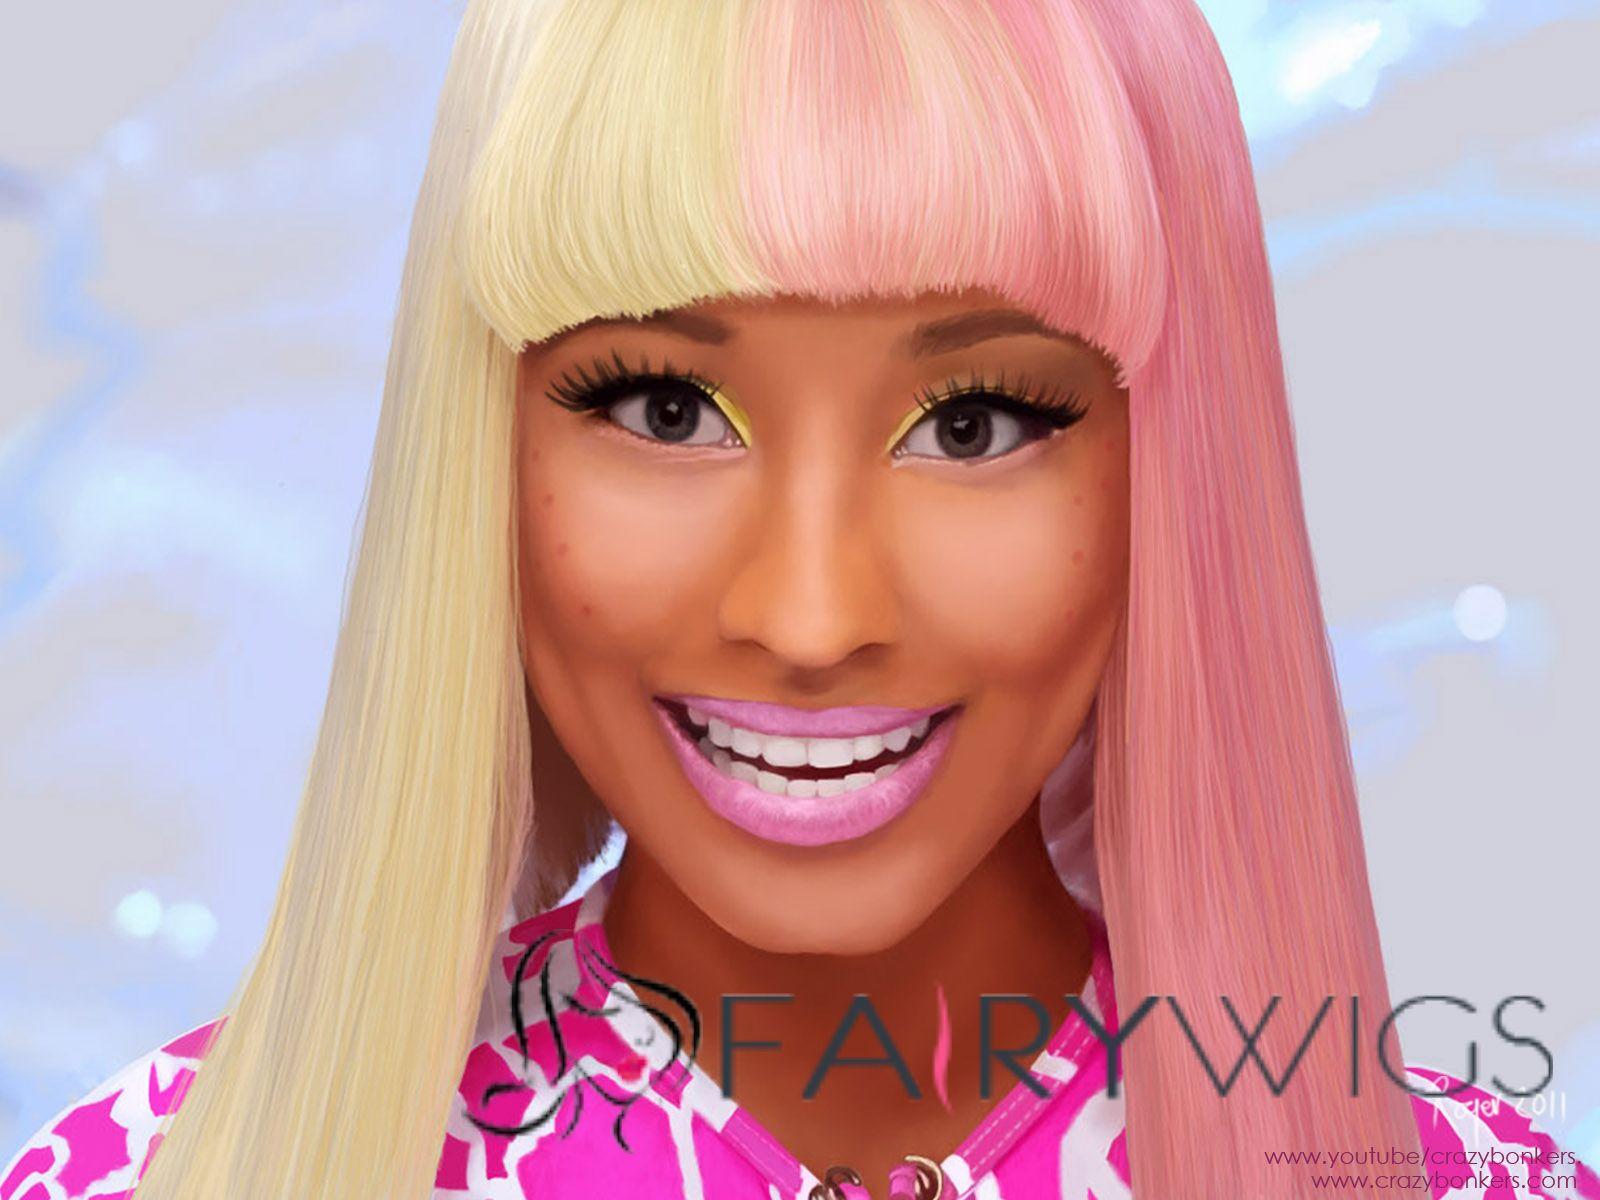 Cheap Nicki Minaj Wigs Best Nicki Minaj Wigs Online Store